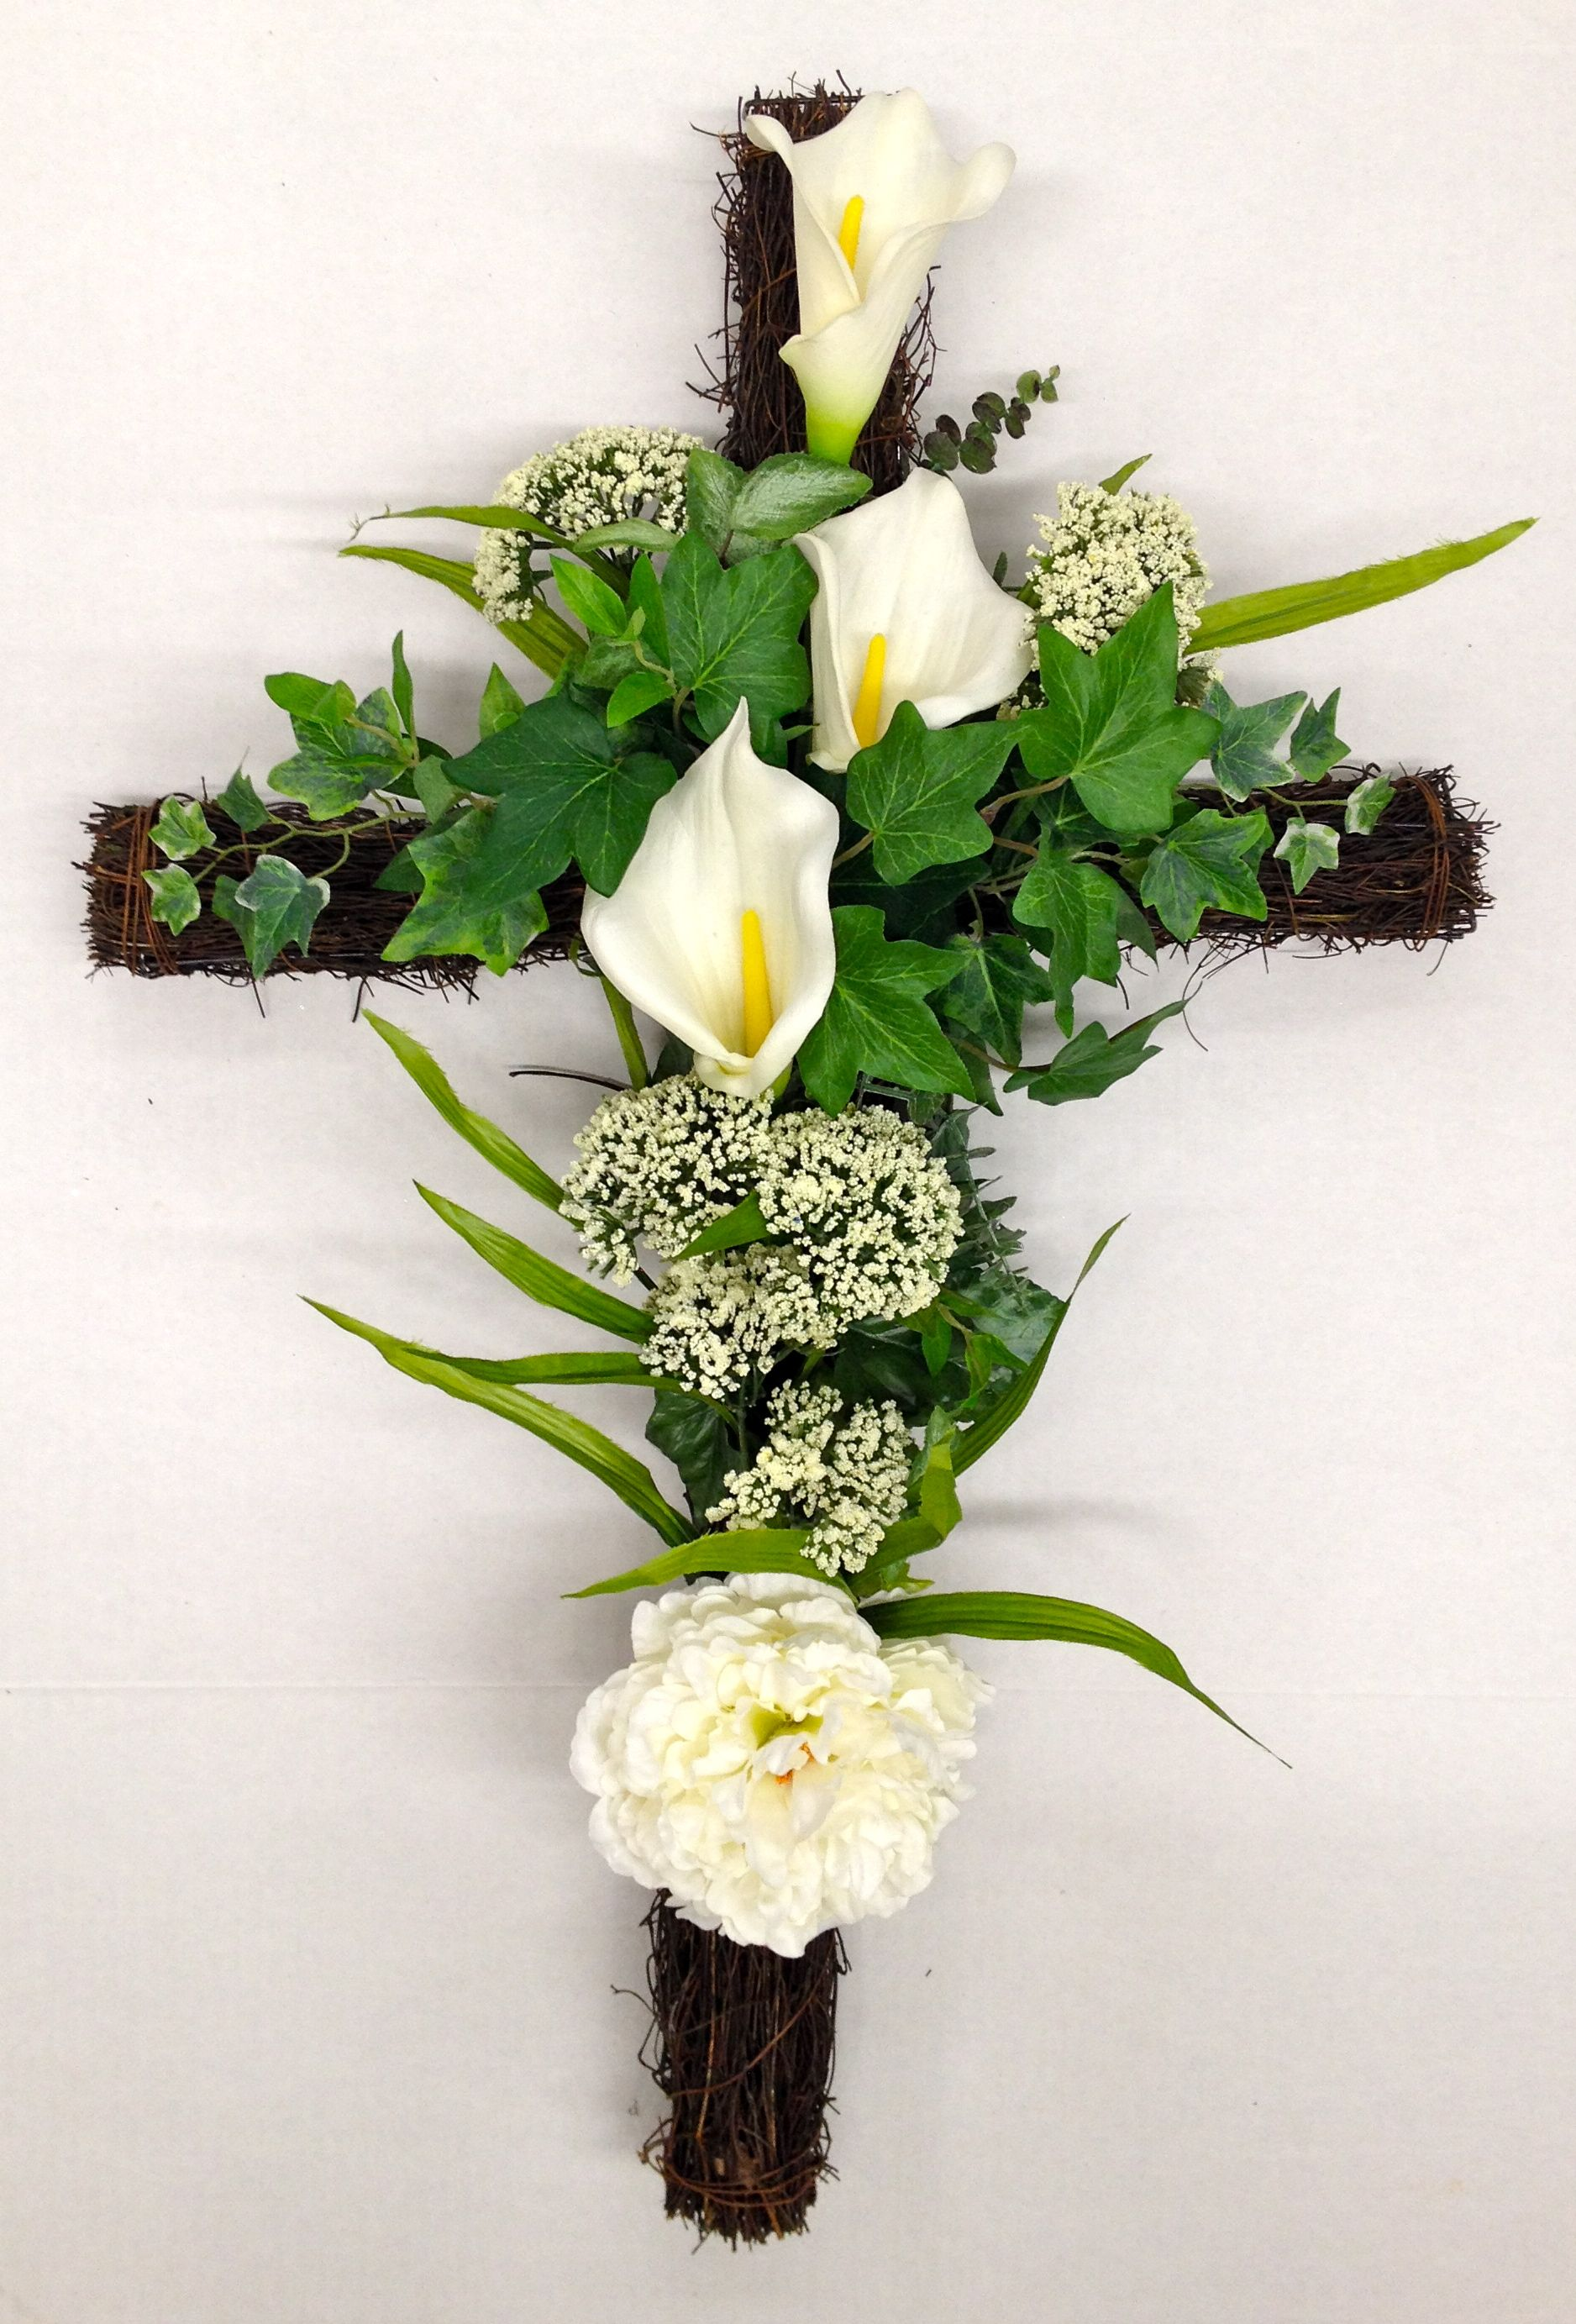 Season Memorial Grape Vine Cross With White Calla Lilies And Wild